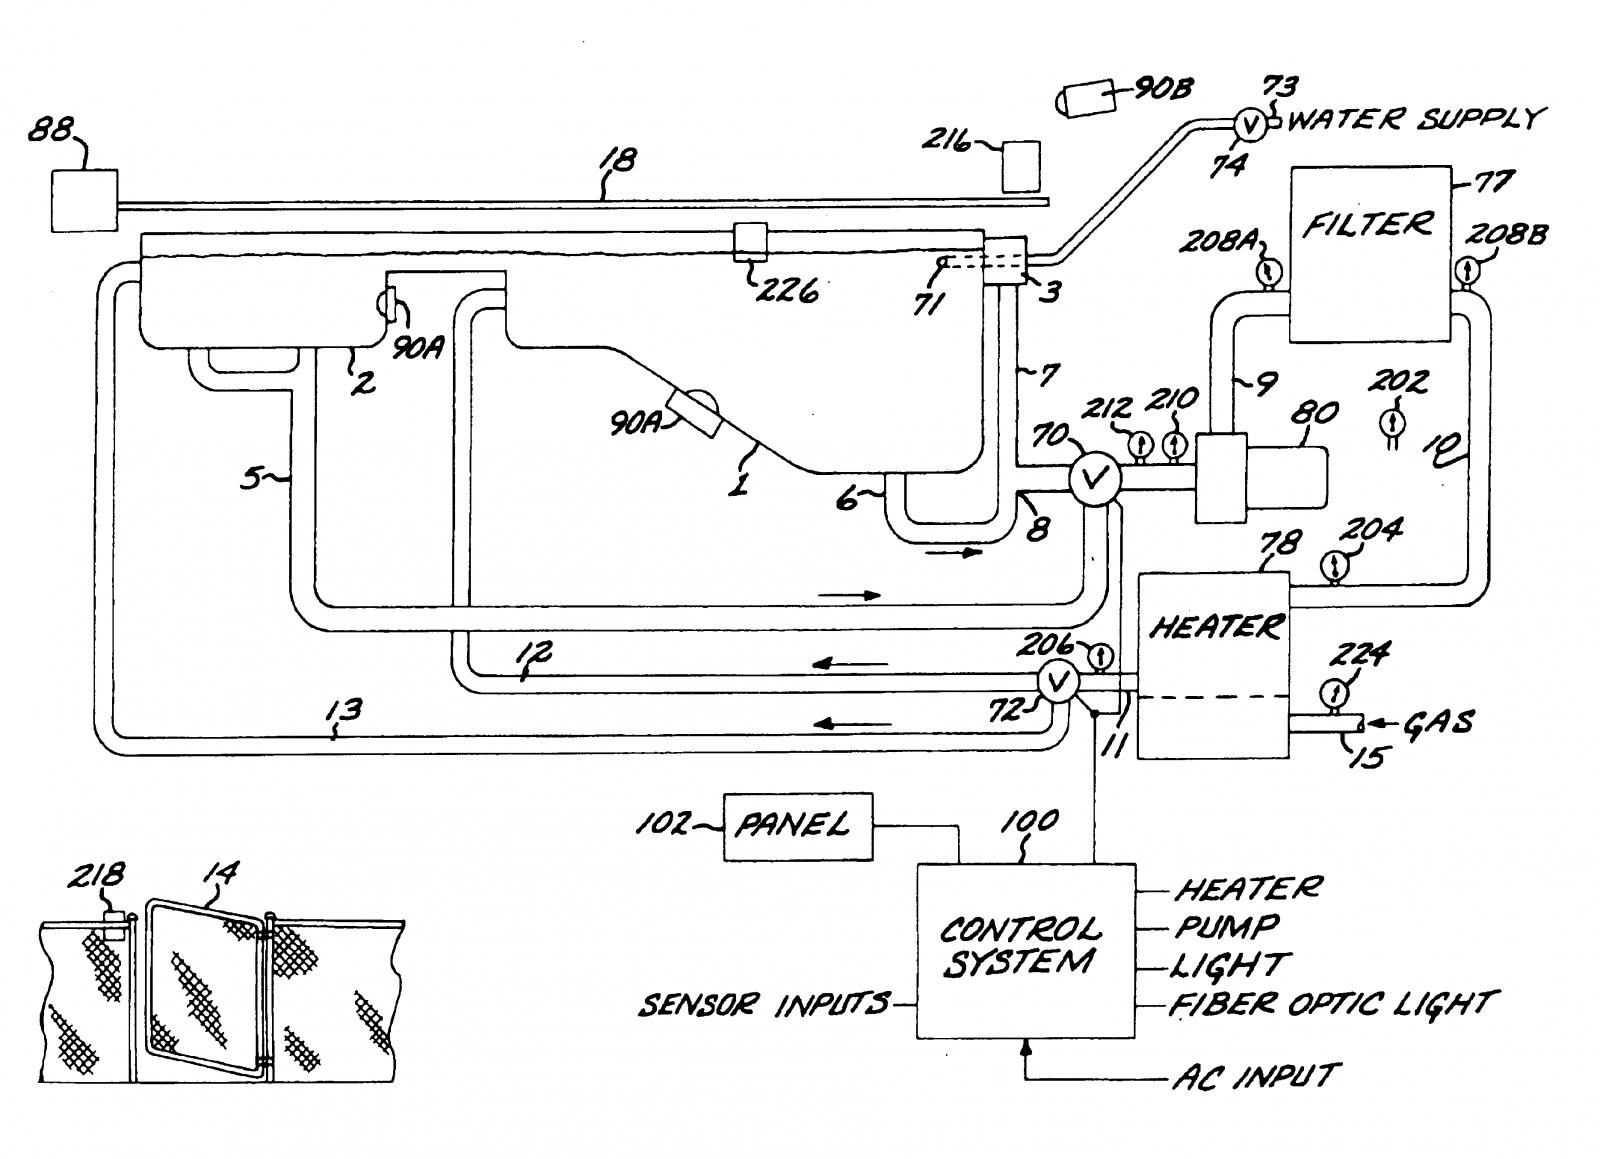 irrigation wiring diagram